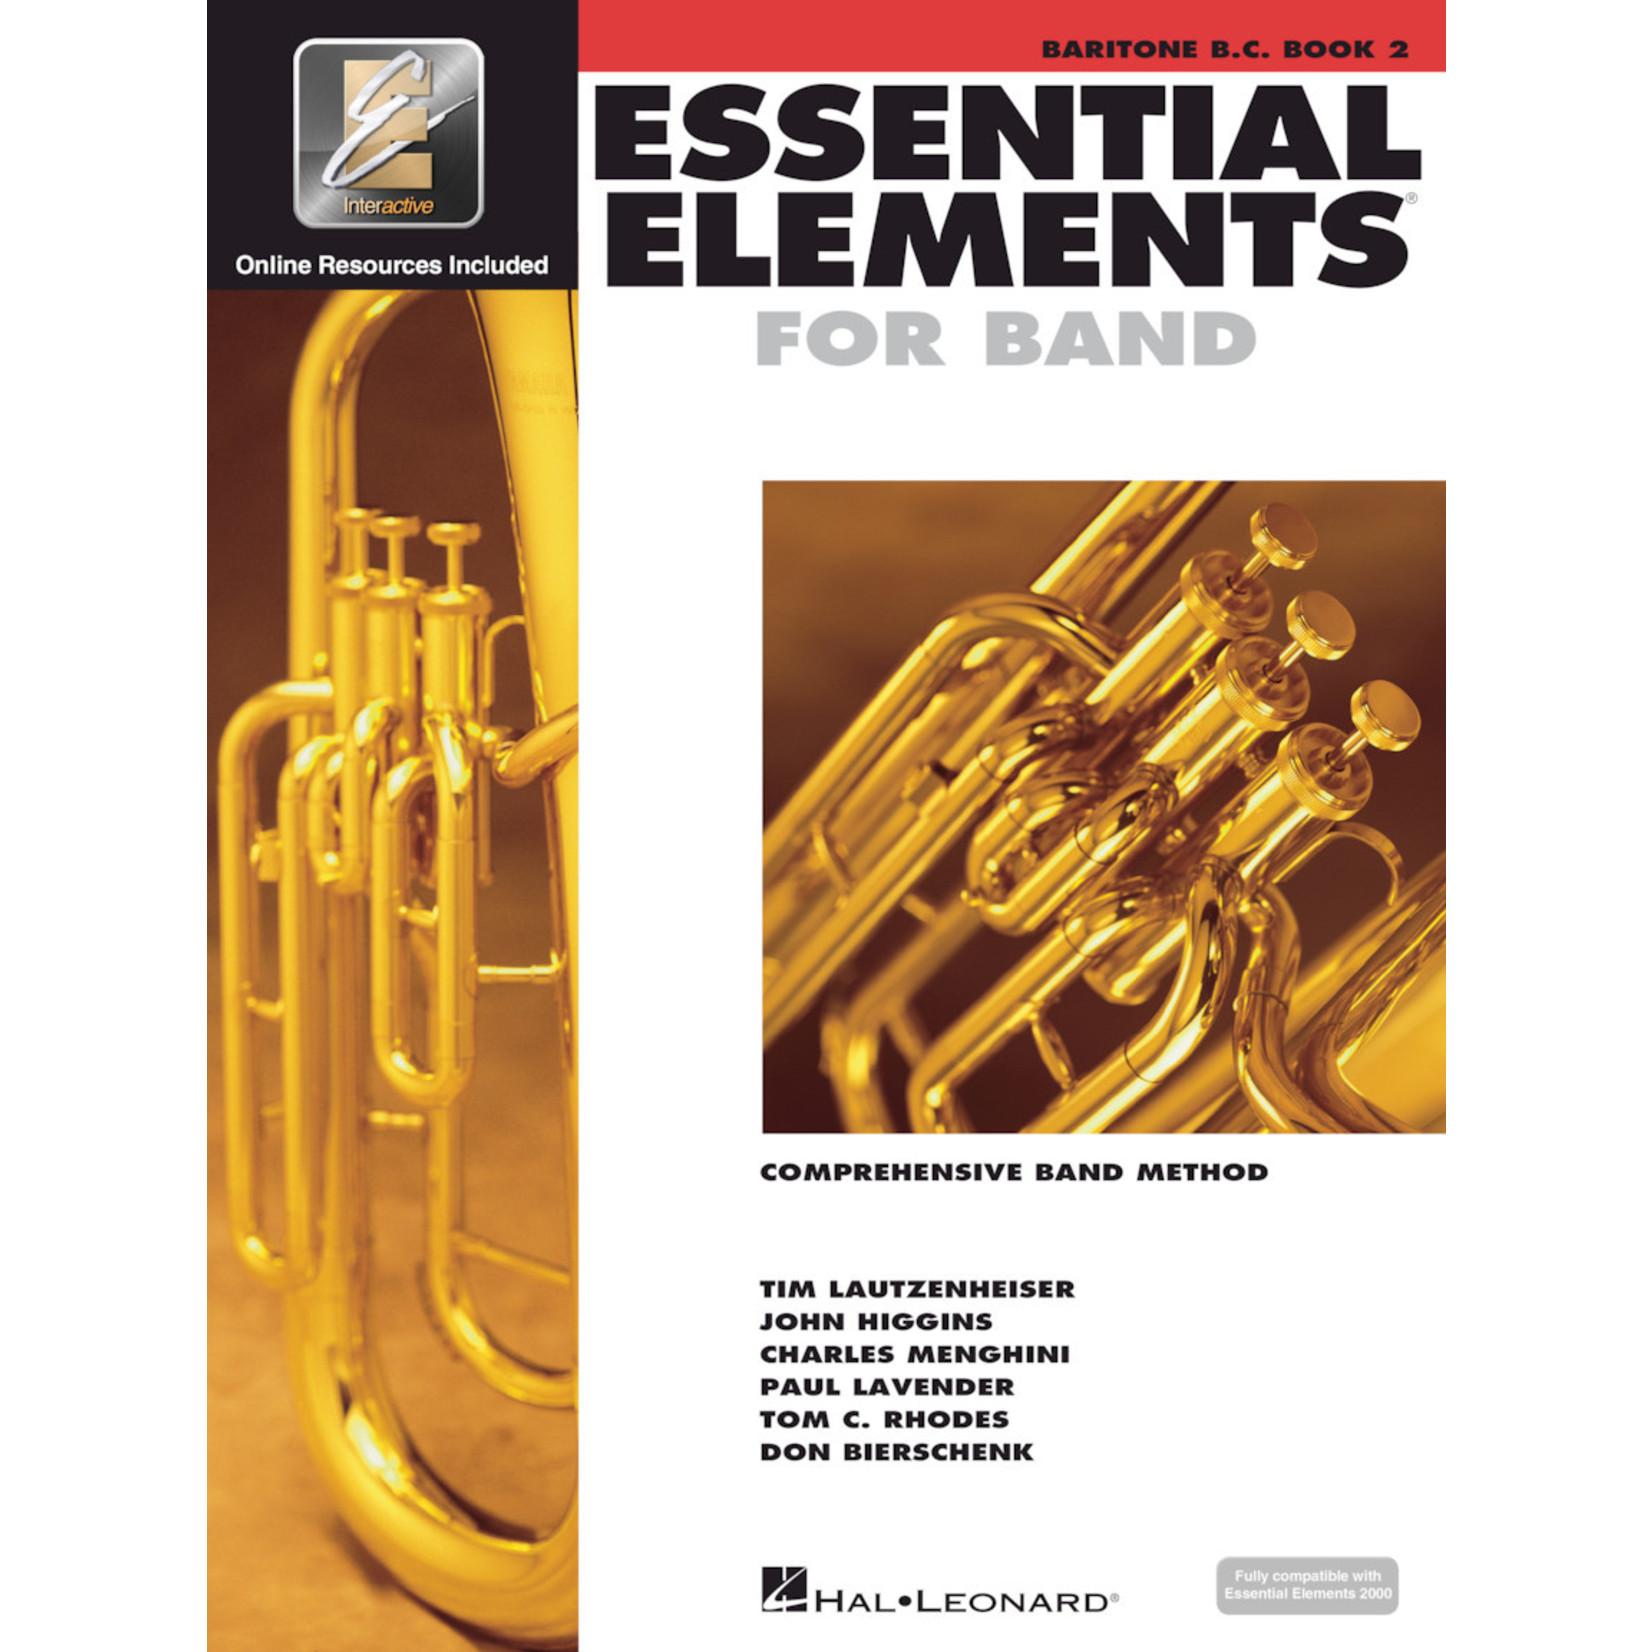 Hal Leonard Essential Elements for Band Baritone Bass Clef Book 2